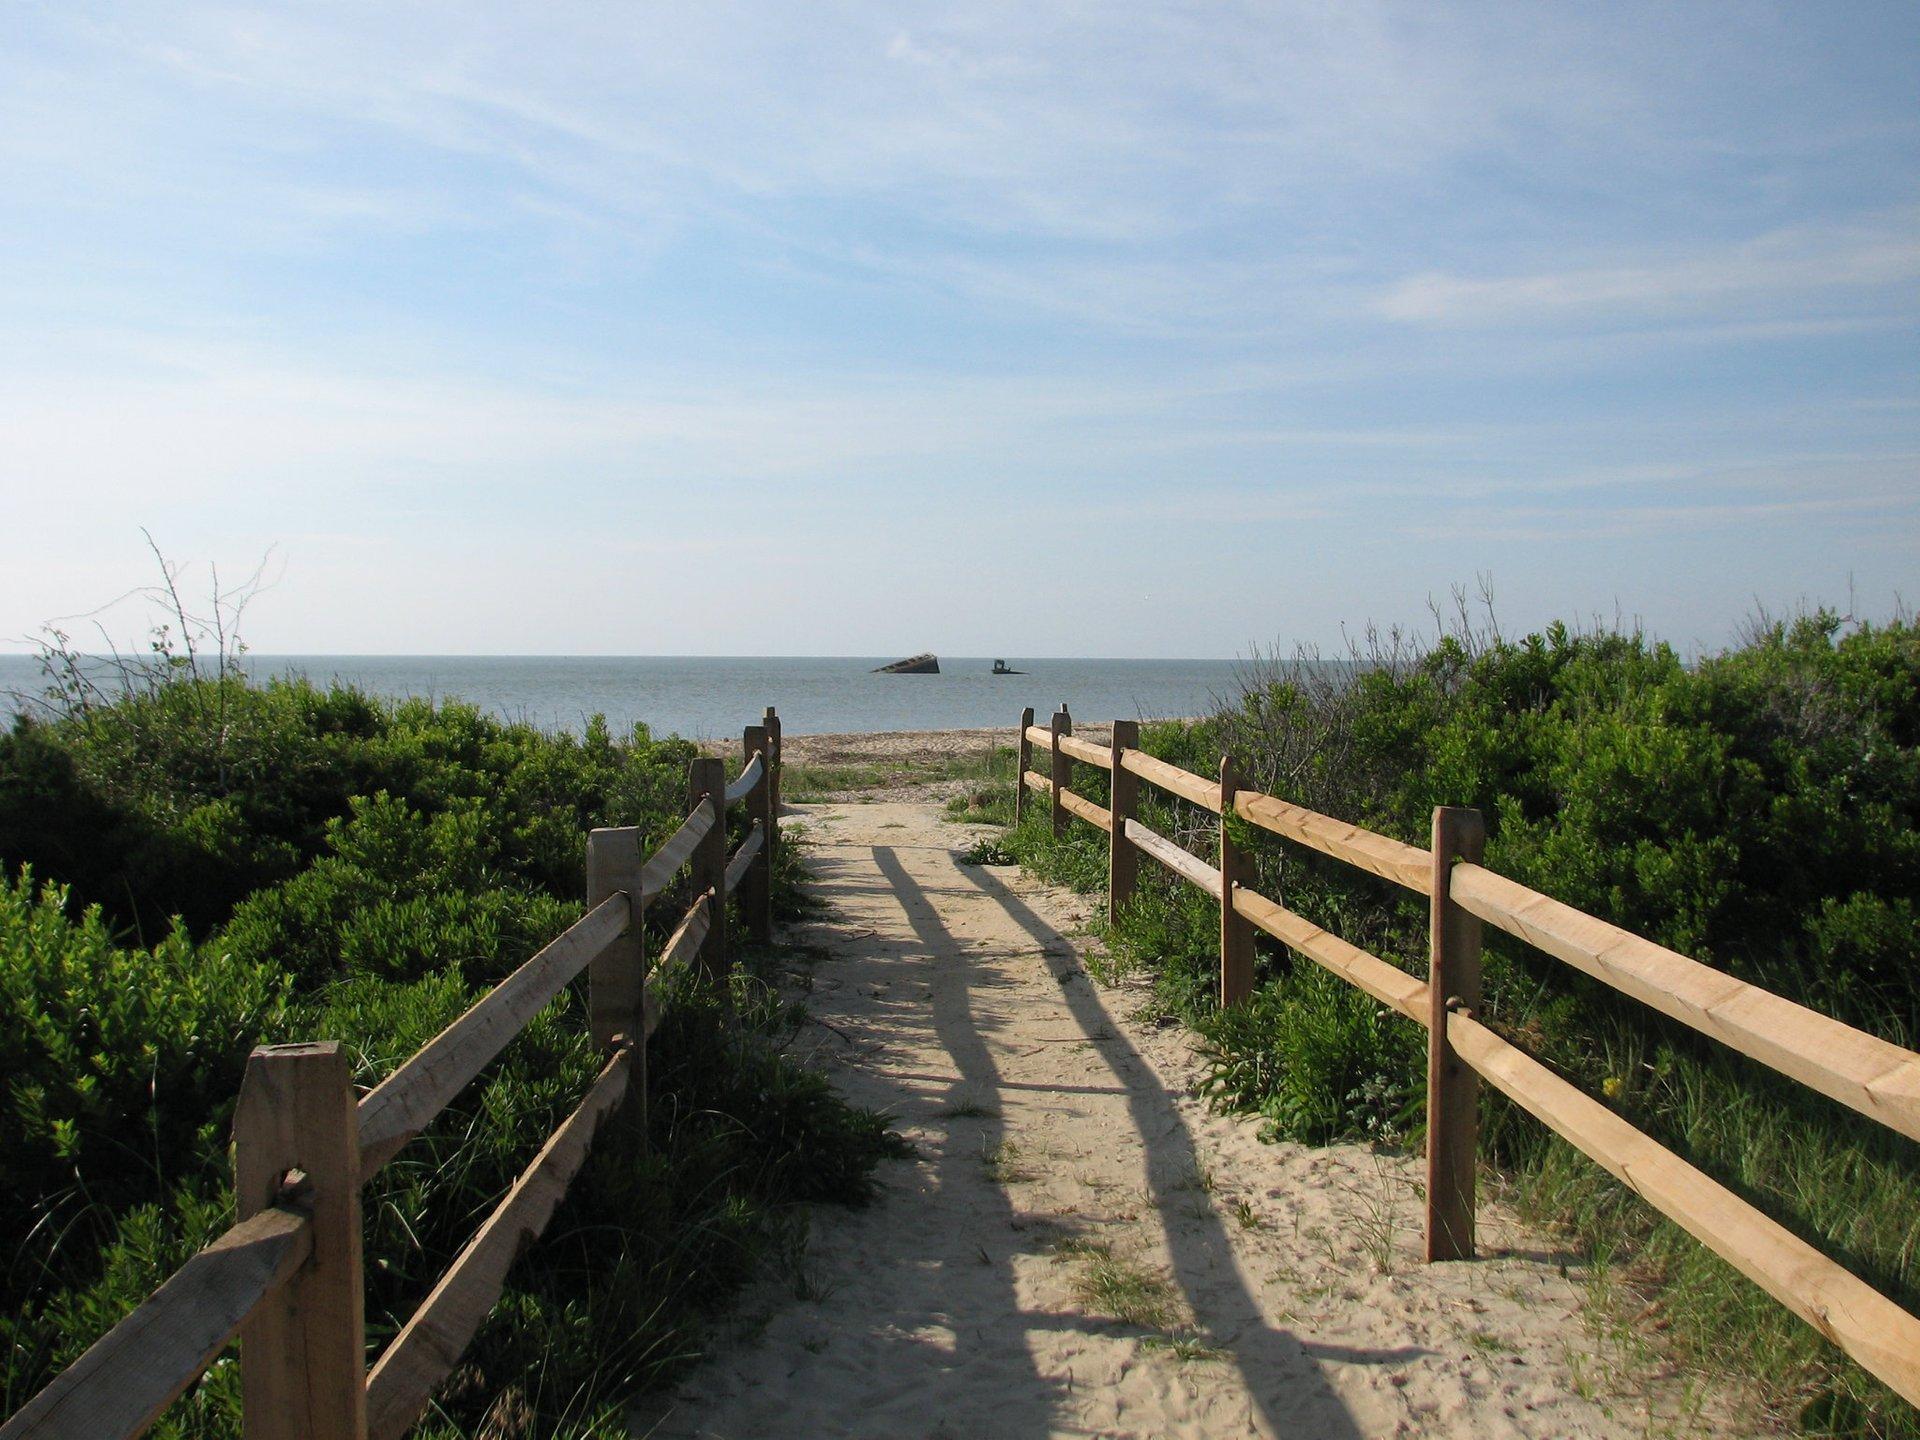 Sunset Beach, Cape May Point, NJ 2020